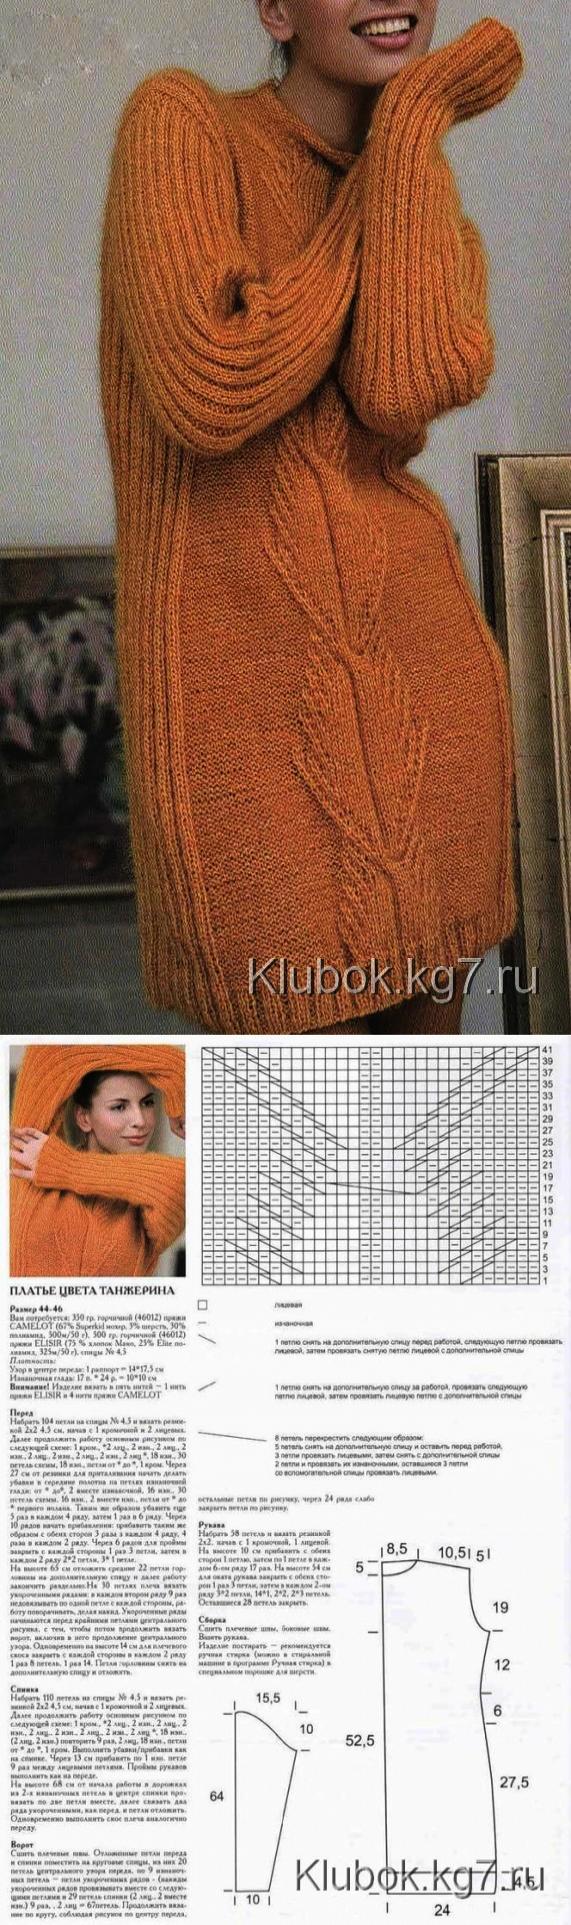 Knitted Dress Pattern Crochet Dress Ebay India Crochet Knitting